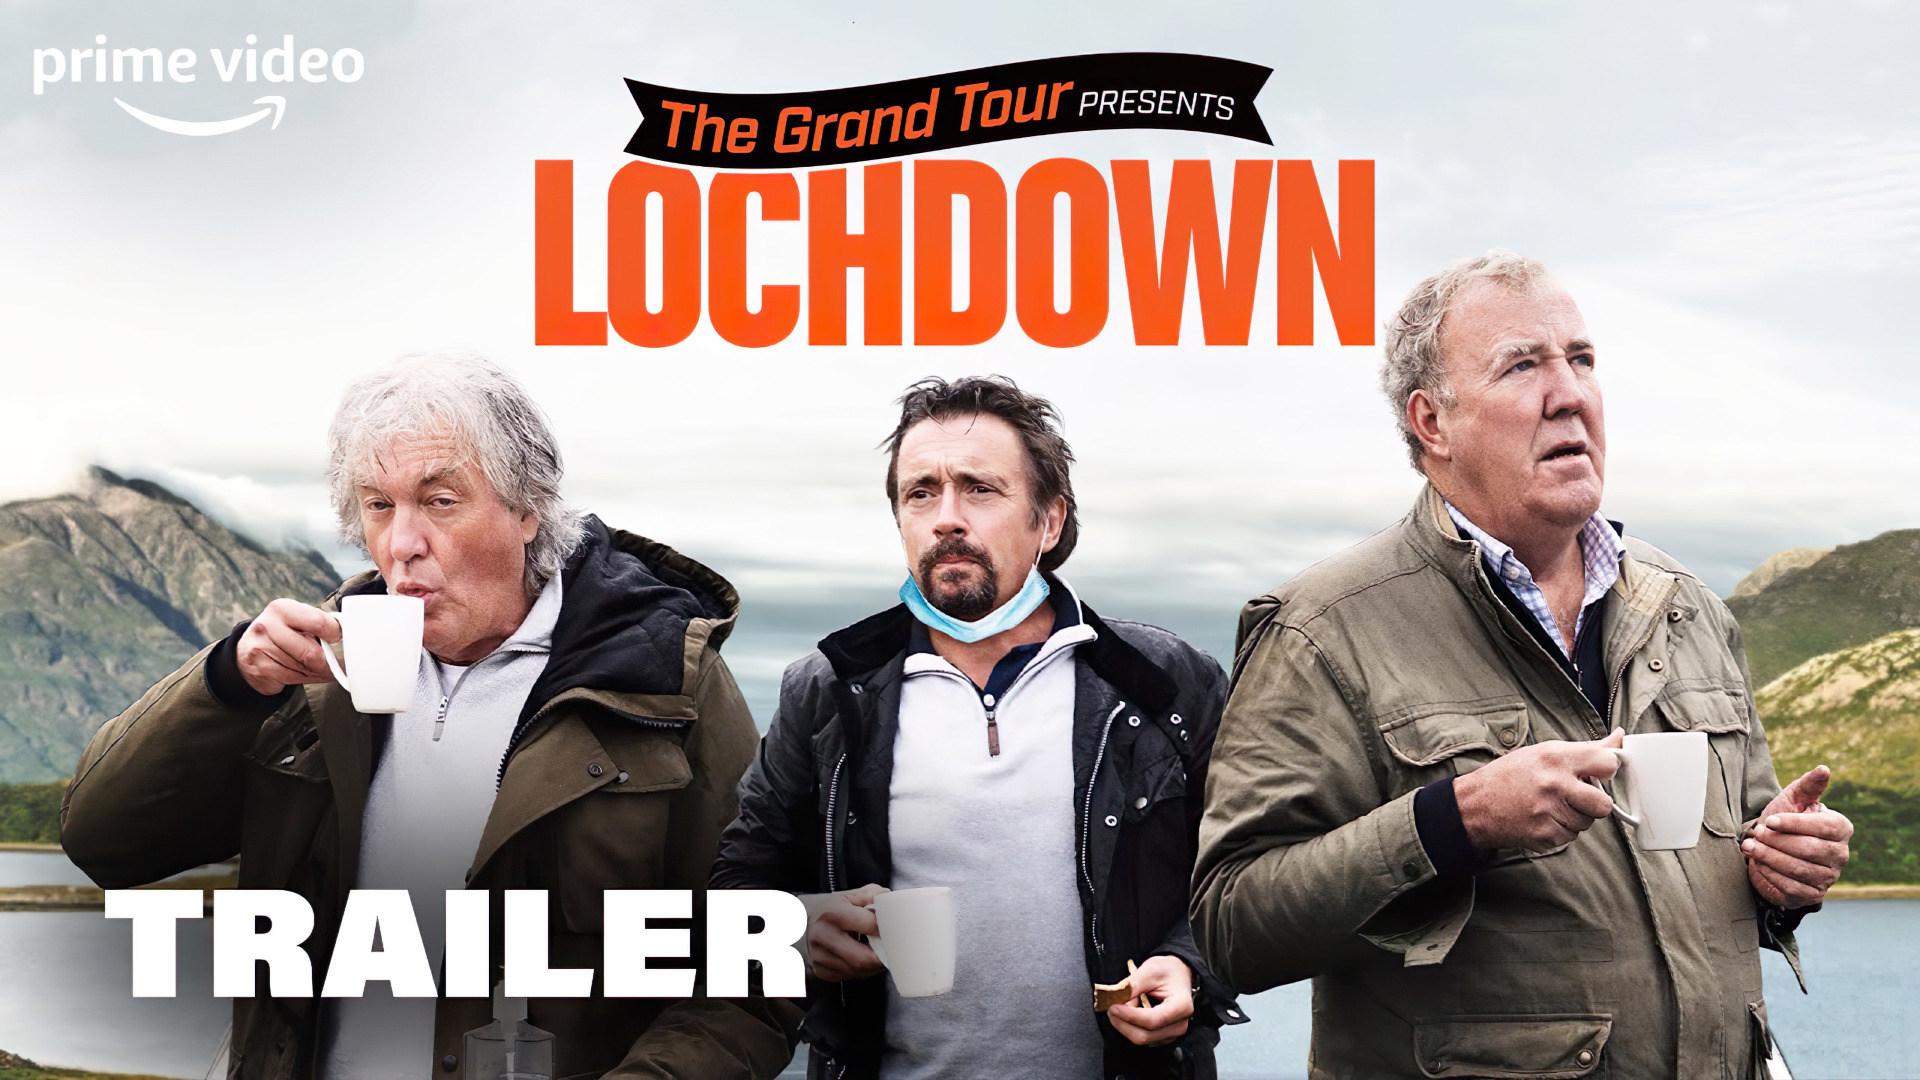 Trailer, Amazon, Serie, Amazon Prime Video, Amazon Prime, Prime Video, Dokumentation, The Grand Tour, Special, Jeremy Clarkson, Richard Hammond, James may, The Grand Tour Lochdown